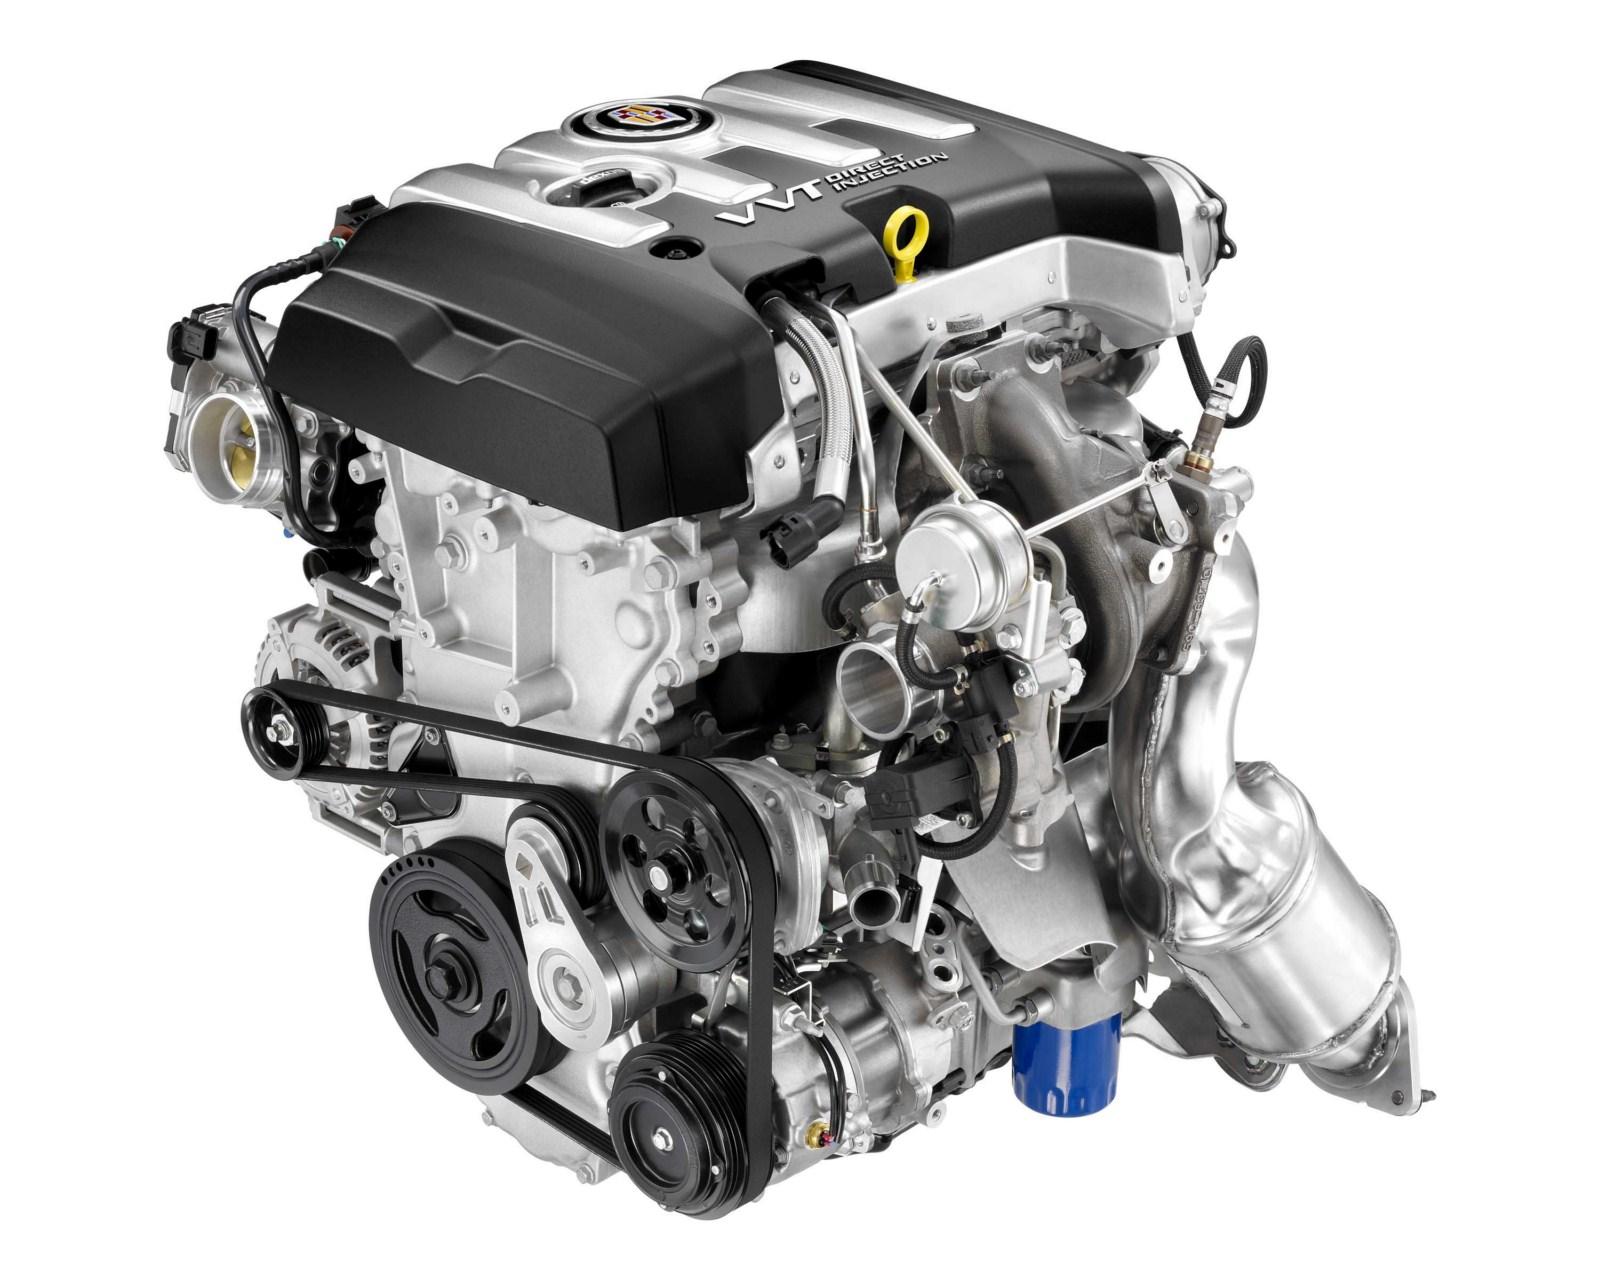 2013 Cadillac Ats 2 0 L Turbo >> O νέος 2.0-λιτρος turbo κινητήρα της Cadillac ATS με 270 ...